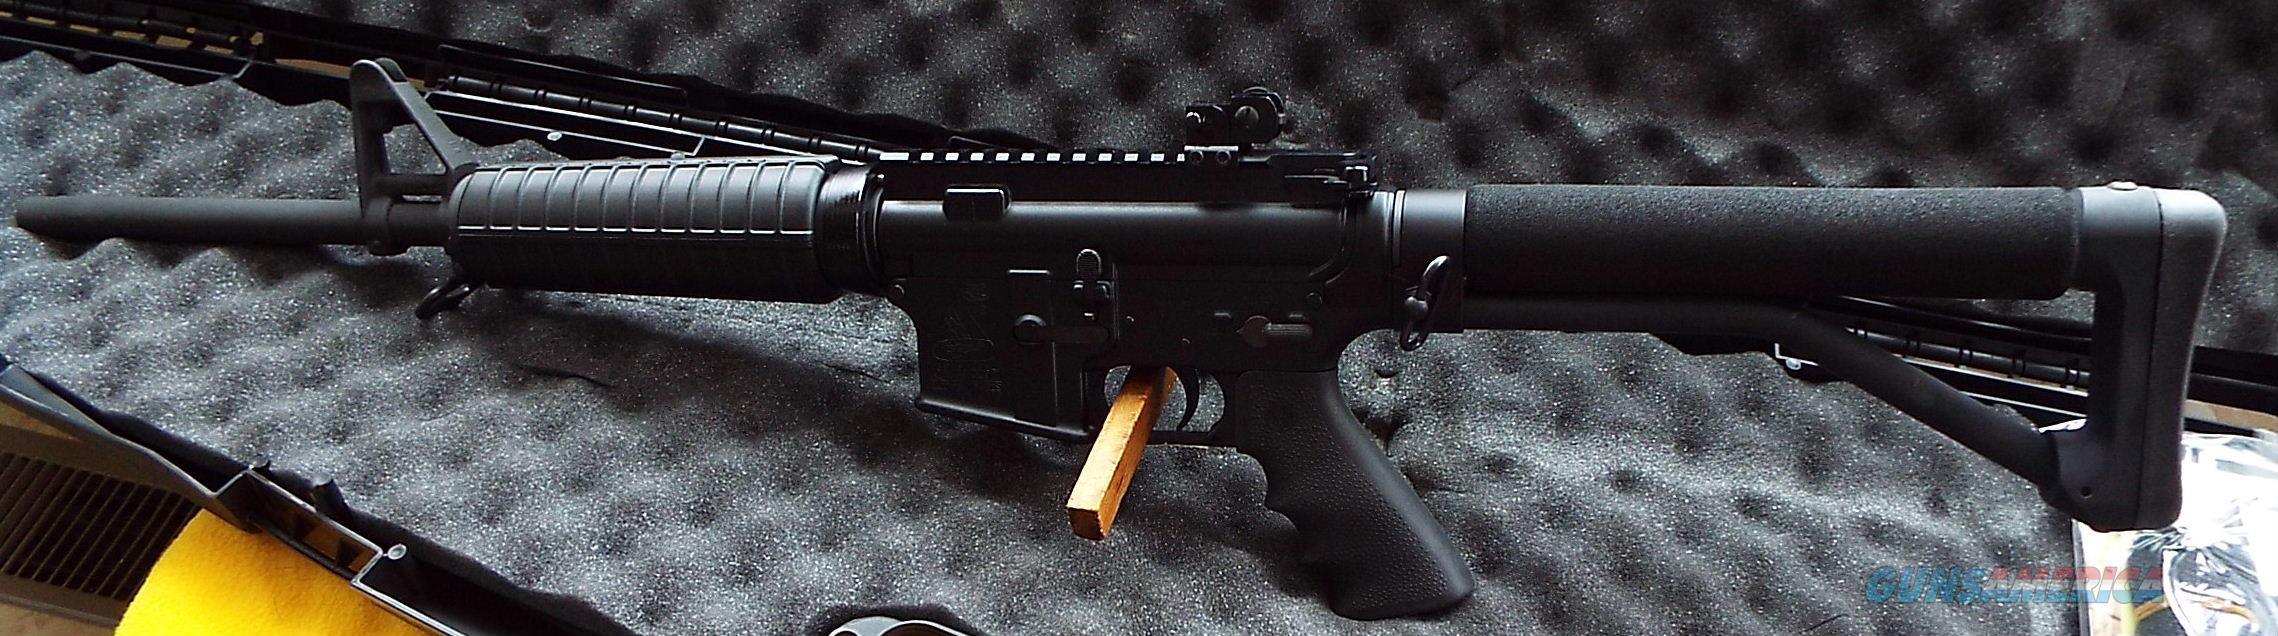 Bushmaster XM15-E2S AR15 Flat Top 223 / 5.56 NATO   New!    Guns > Rifles > Bushmaster Rifles > Complete Rifles